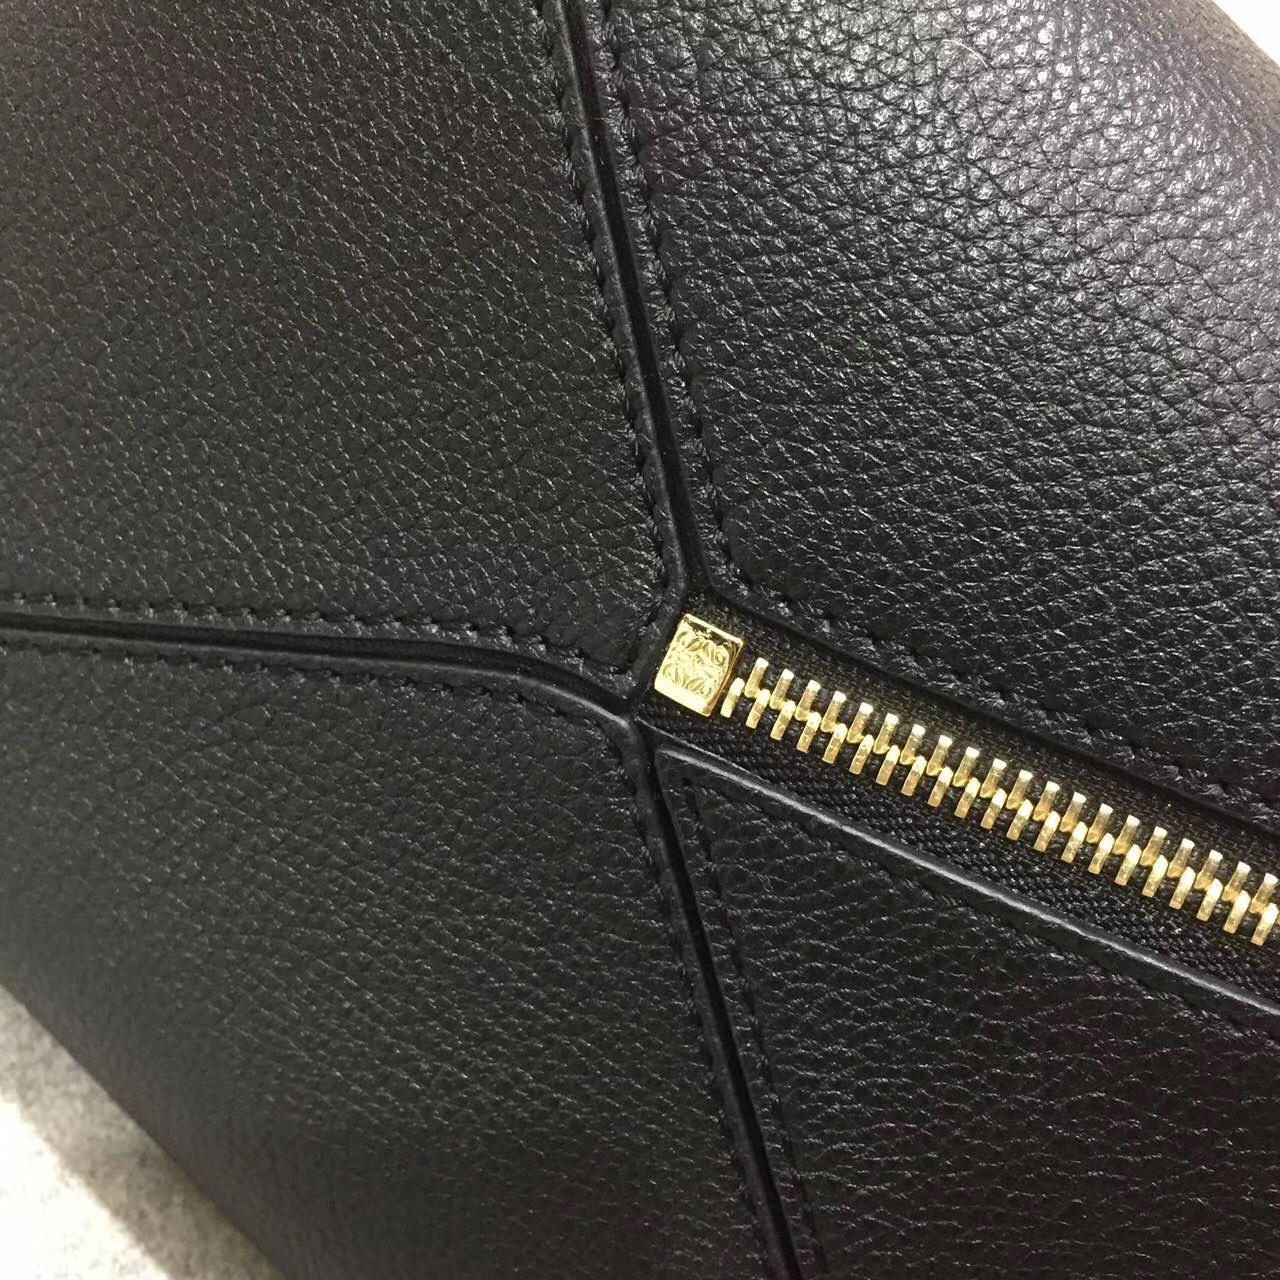 Loewe羅意威幾何包 Puzzle Small Bag Midnight Blue/Black